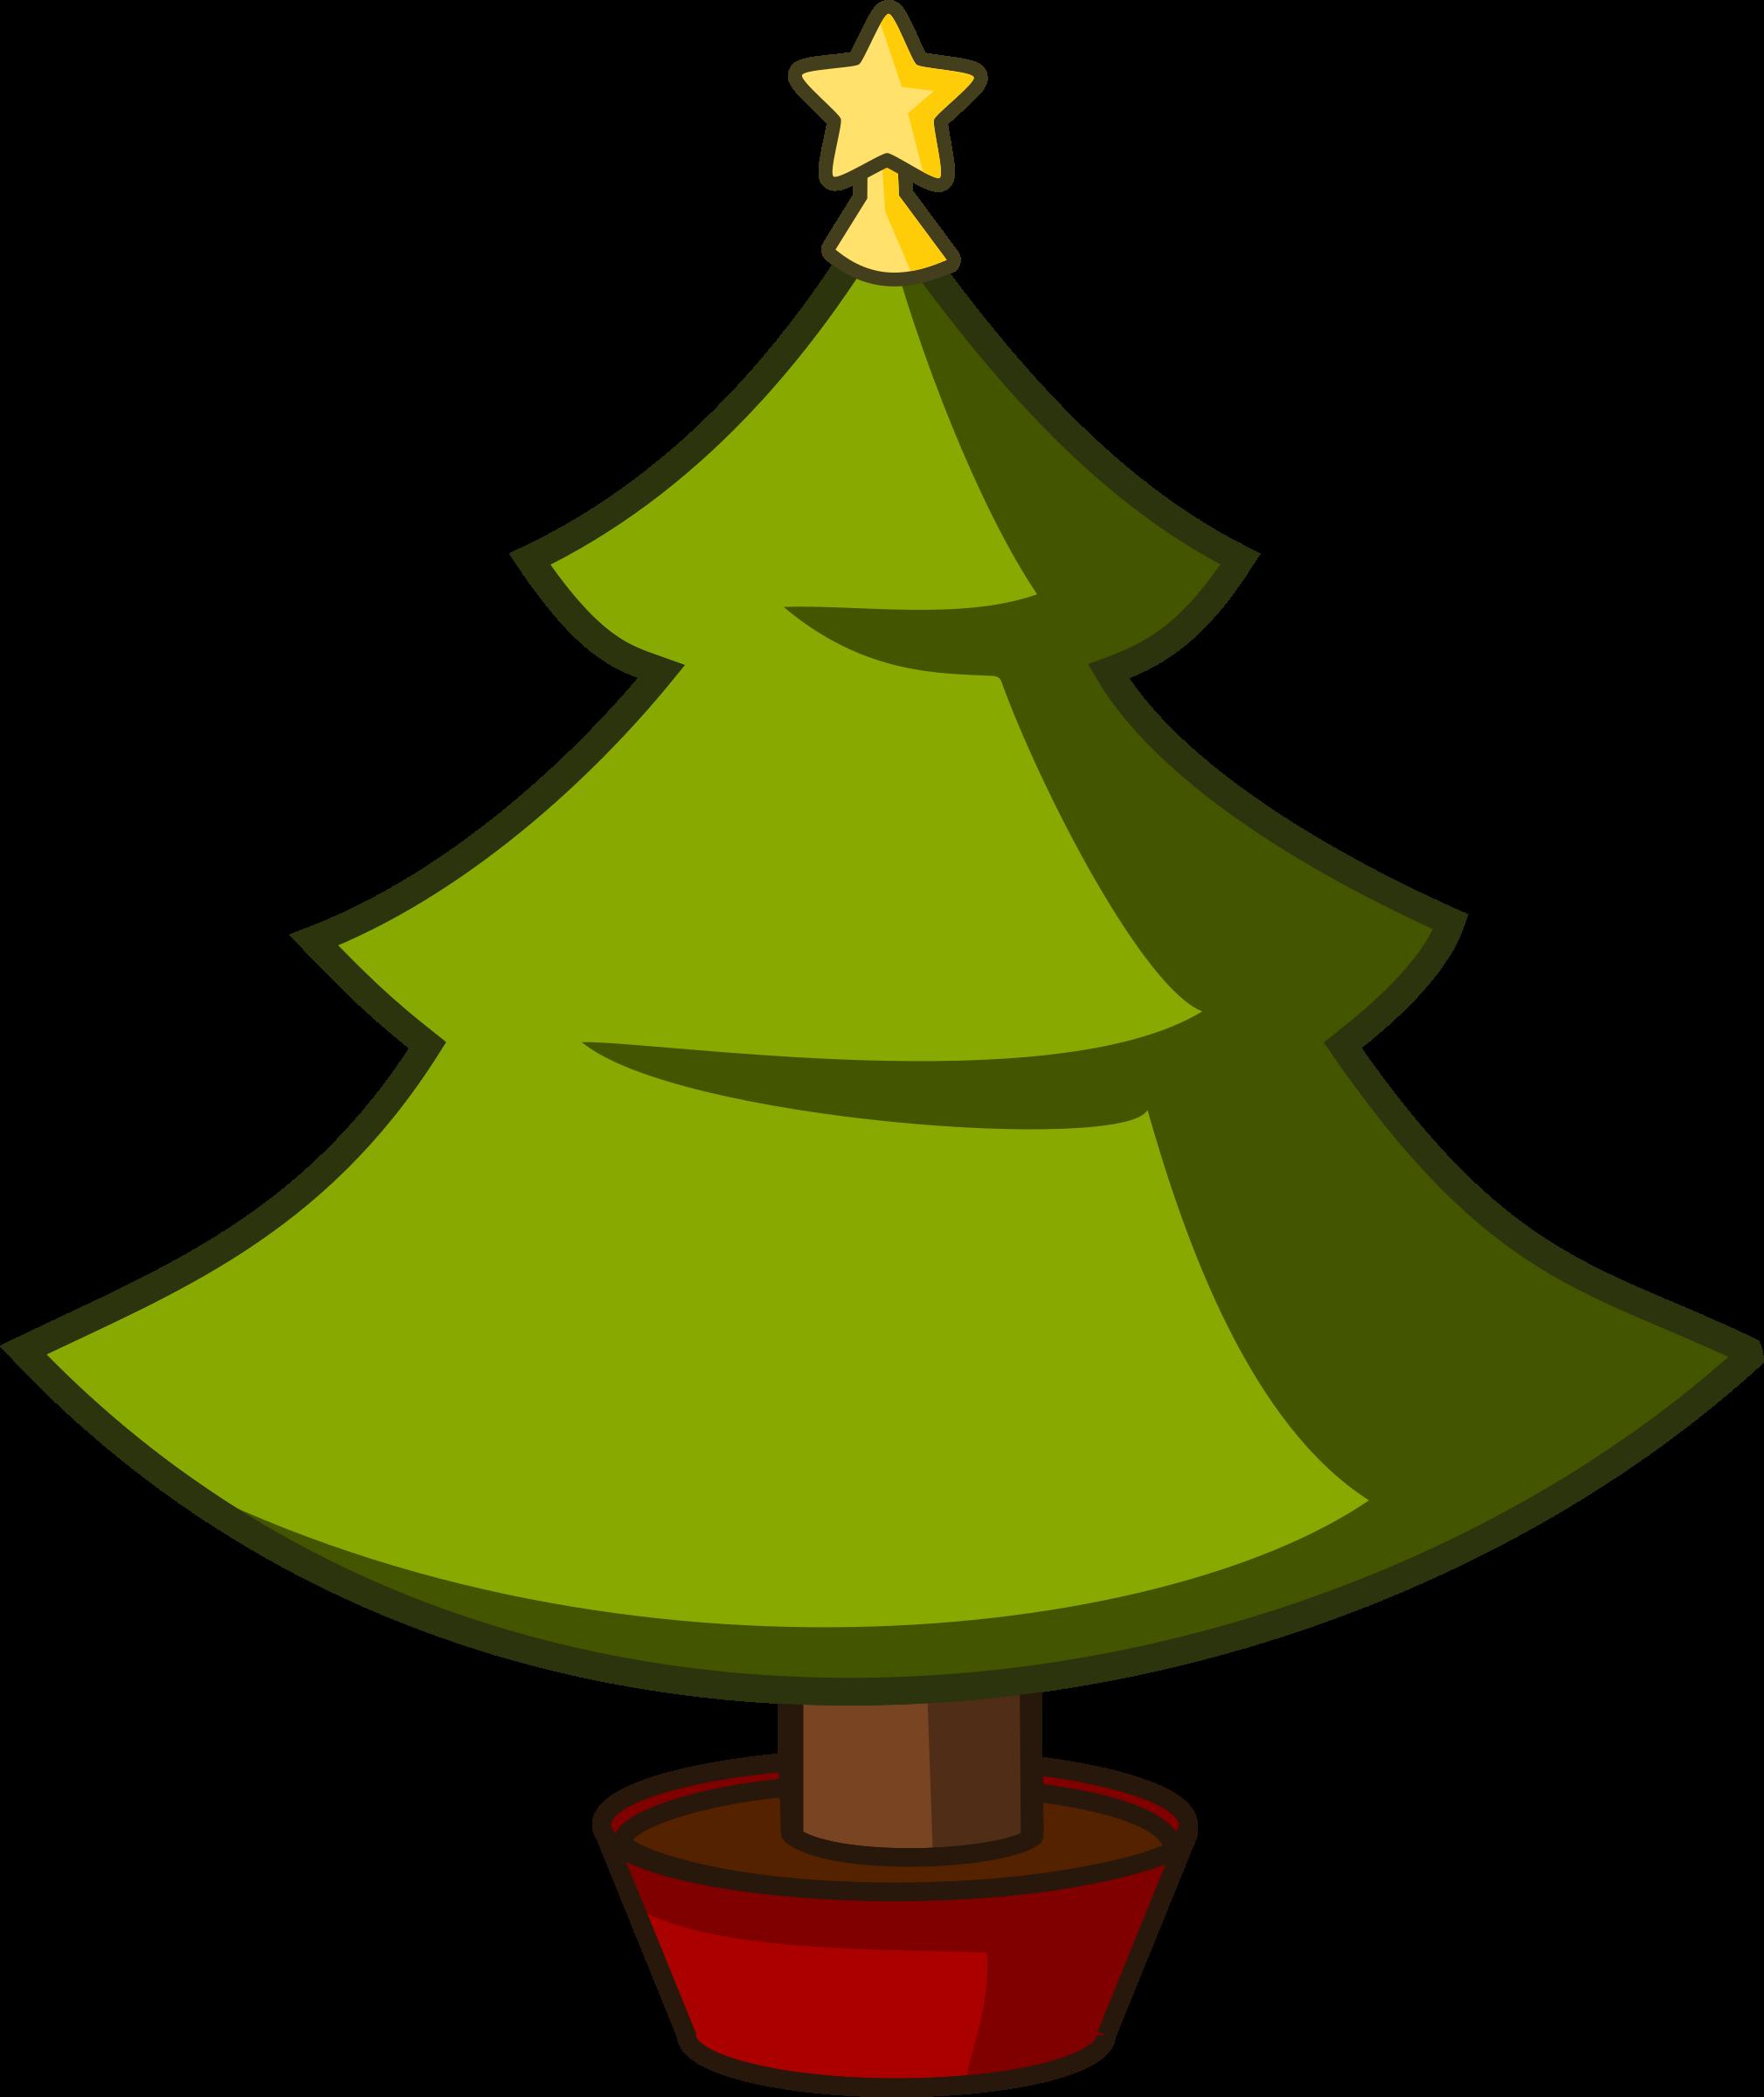 Transparent christmas tree clipart - Cartoon Christmas Tree Clip Art - Simple Cartoon Christmas Tree